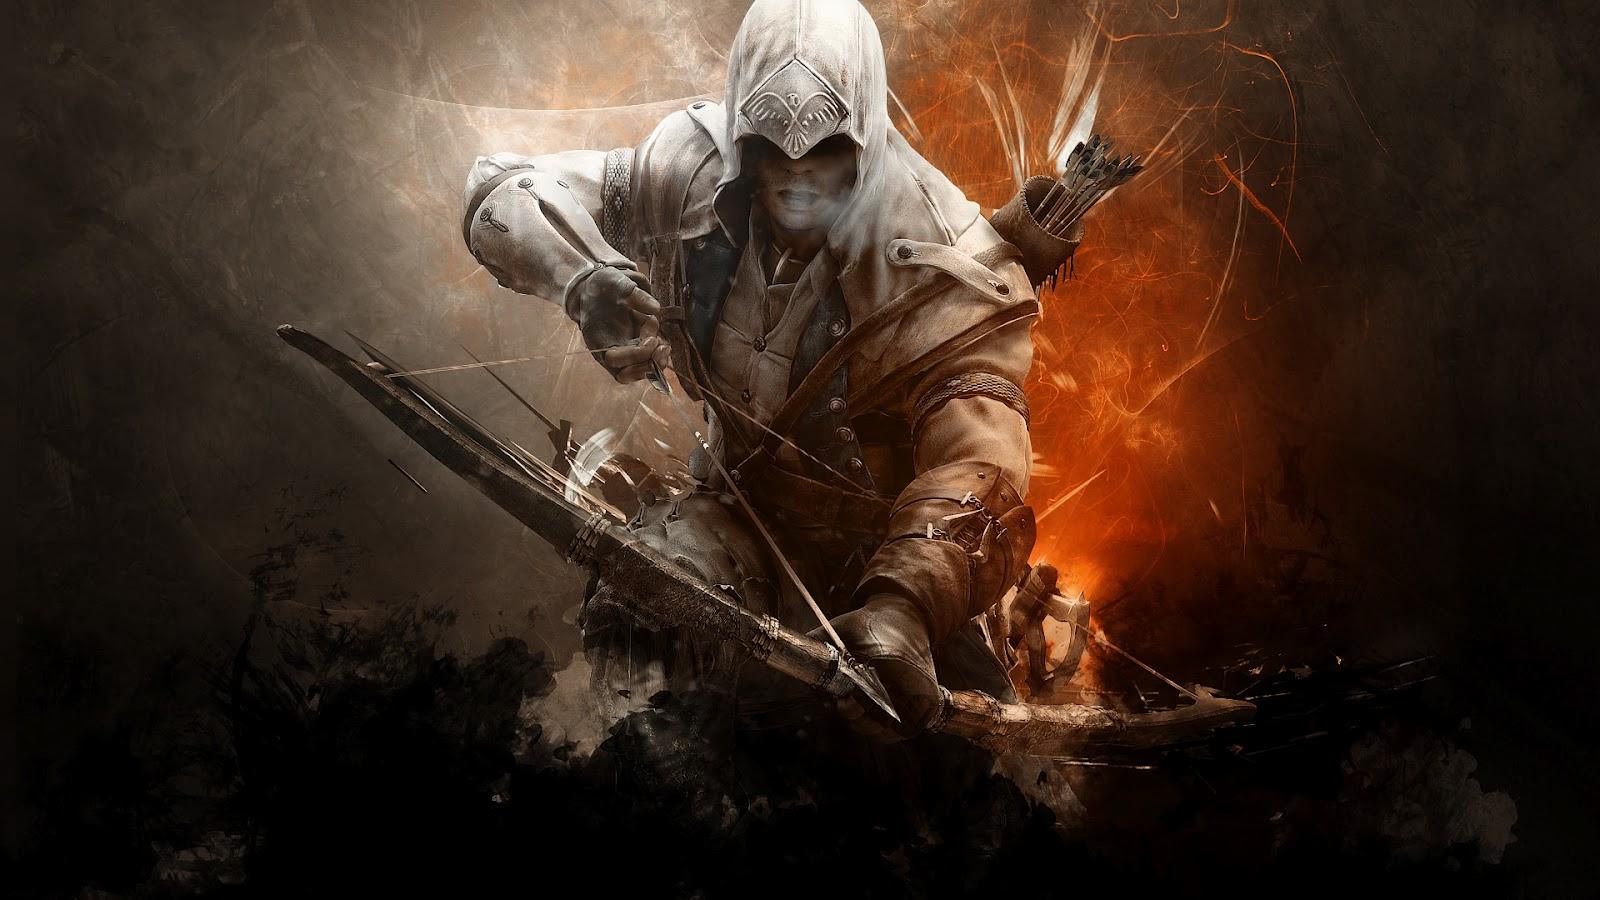 assassin creed 3 hd wallpaper 1080p - hd dock